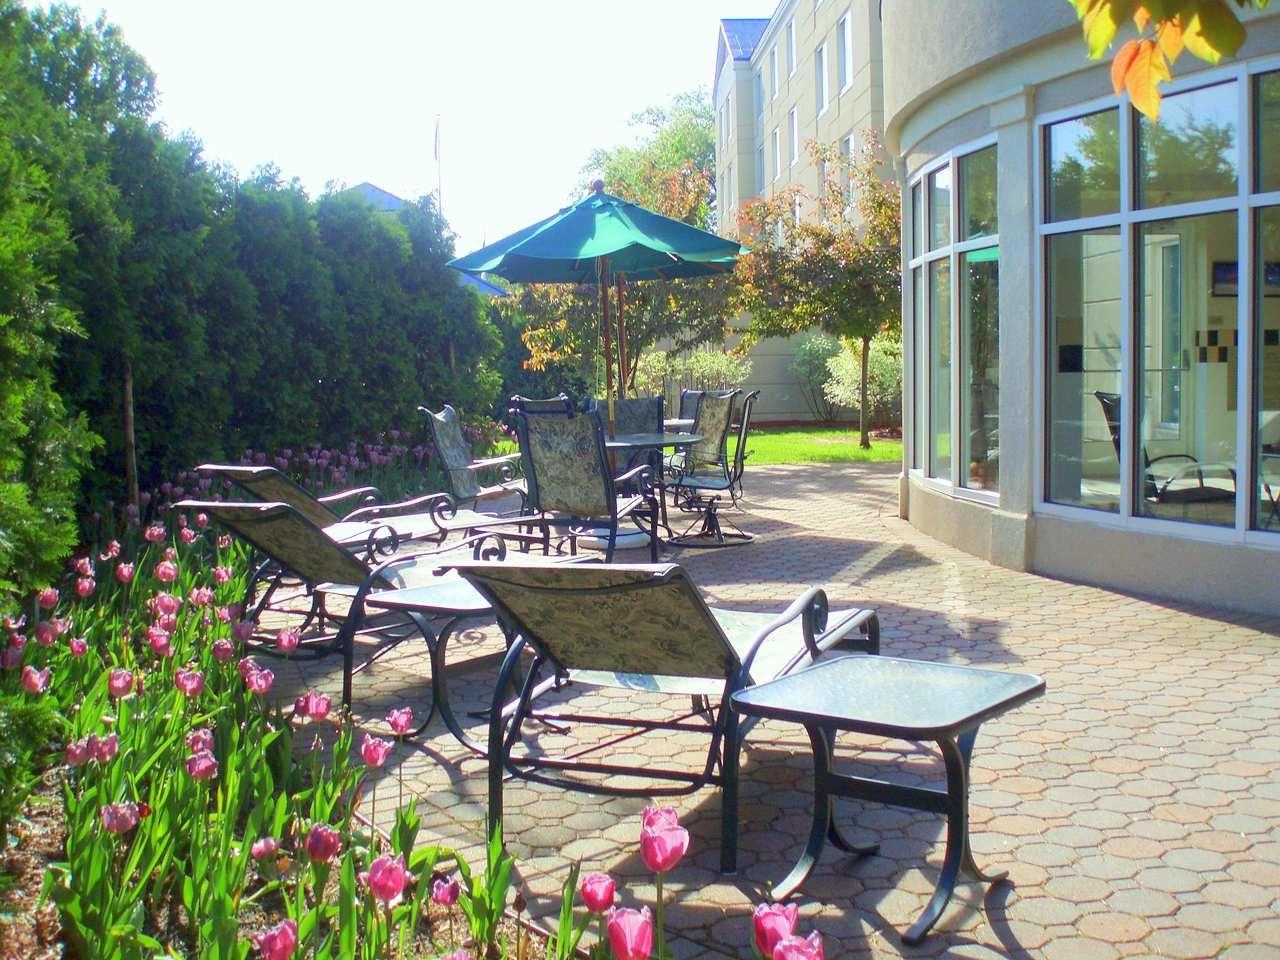 Hilton garden inn saratoga springs in saratoga springs ny - Hilton garden inn saratoga springs ny ...